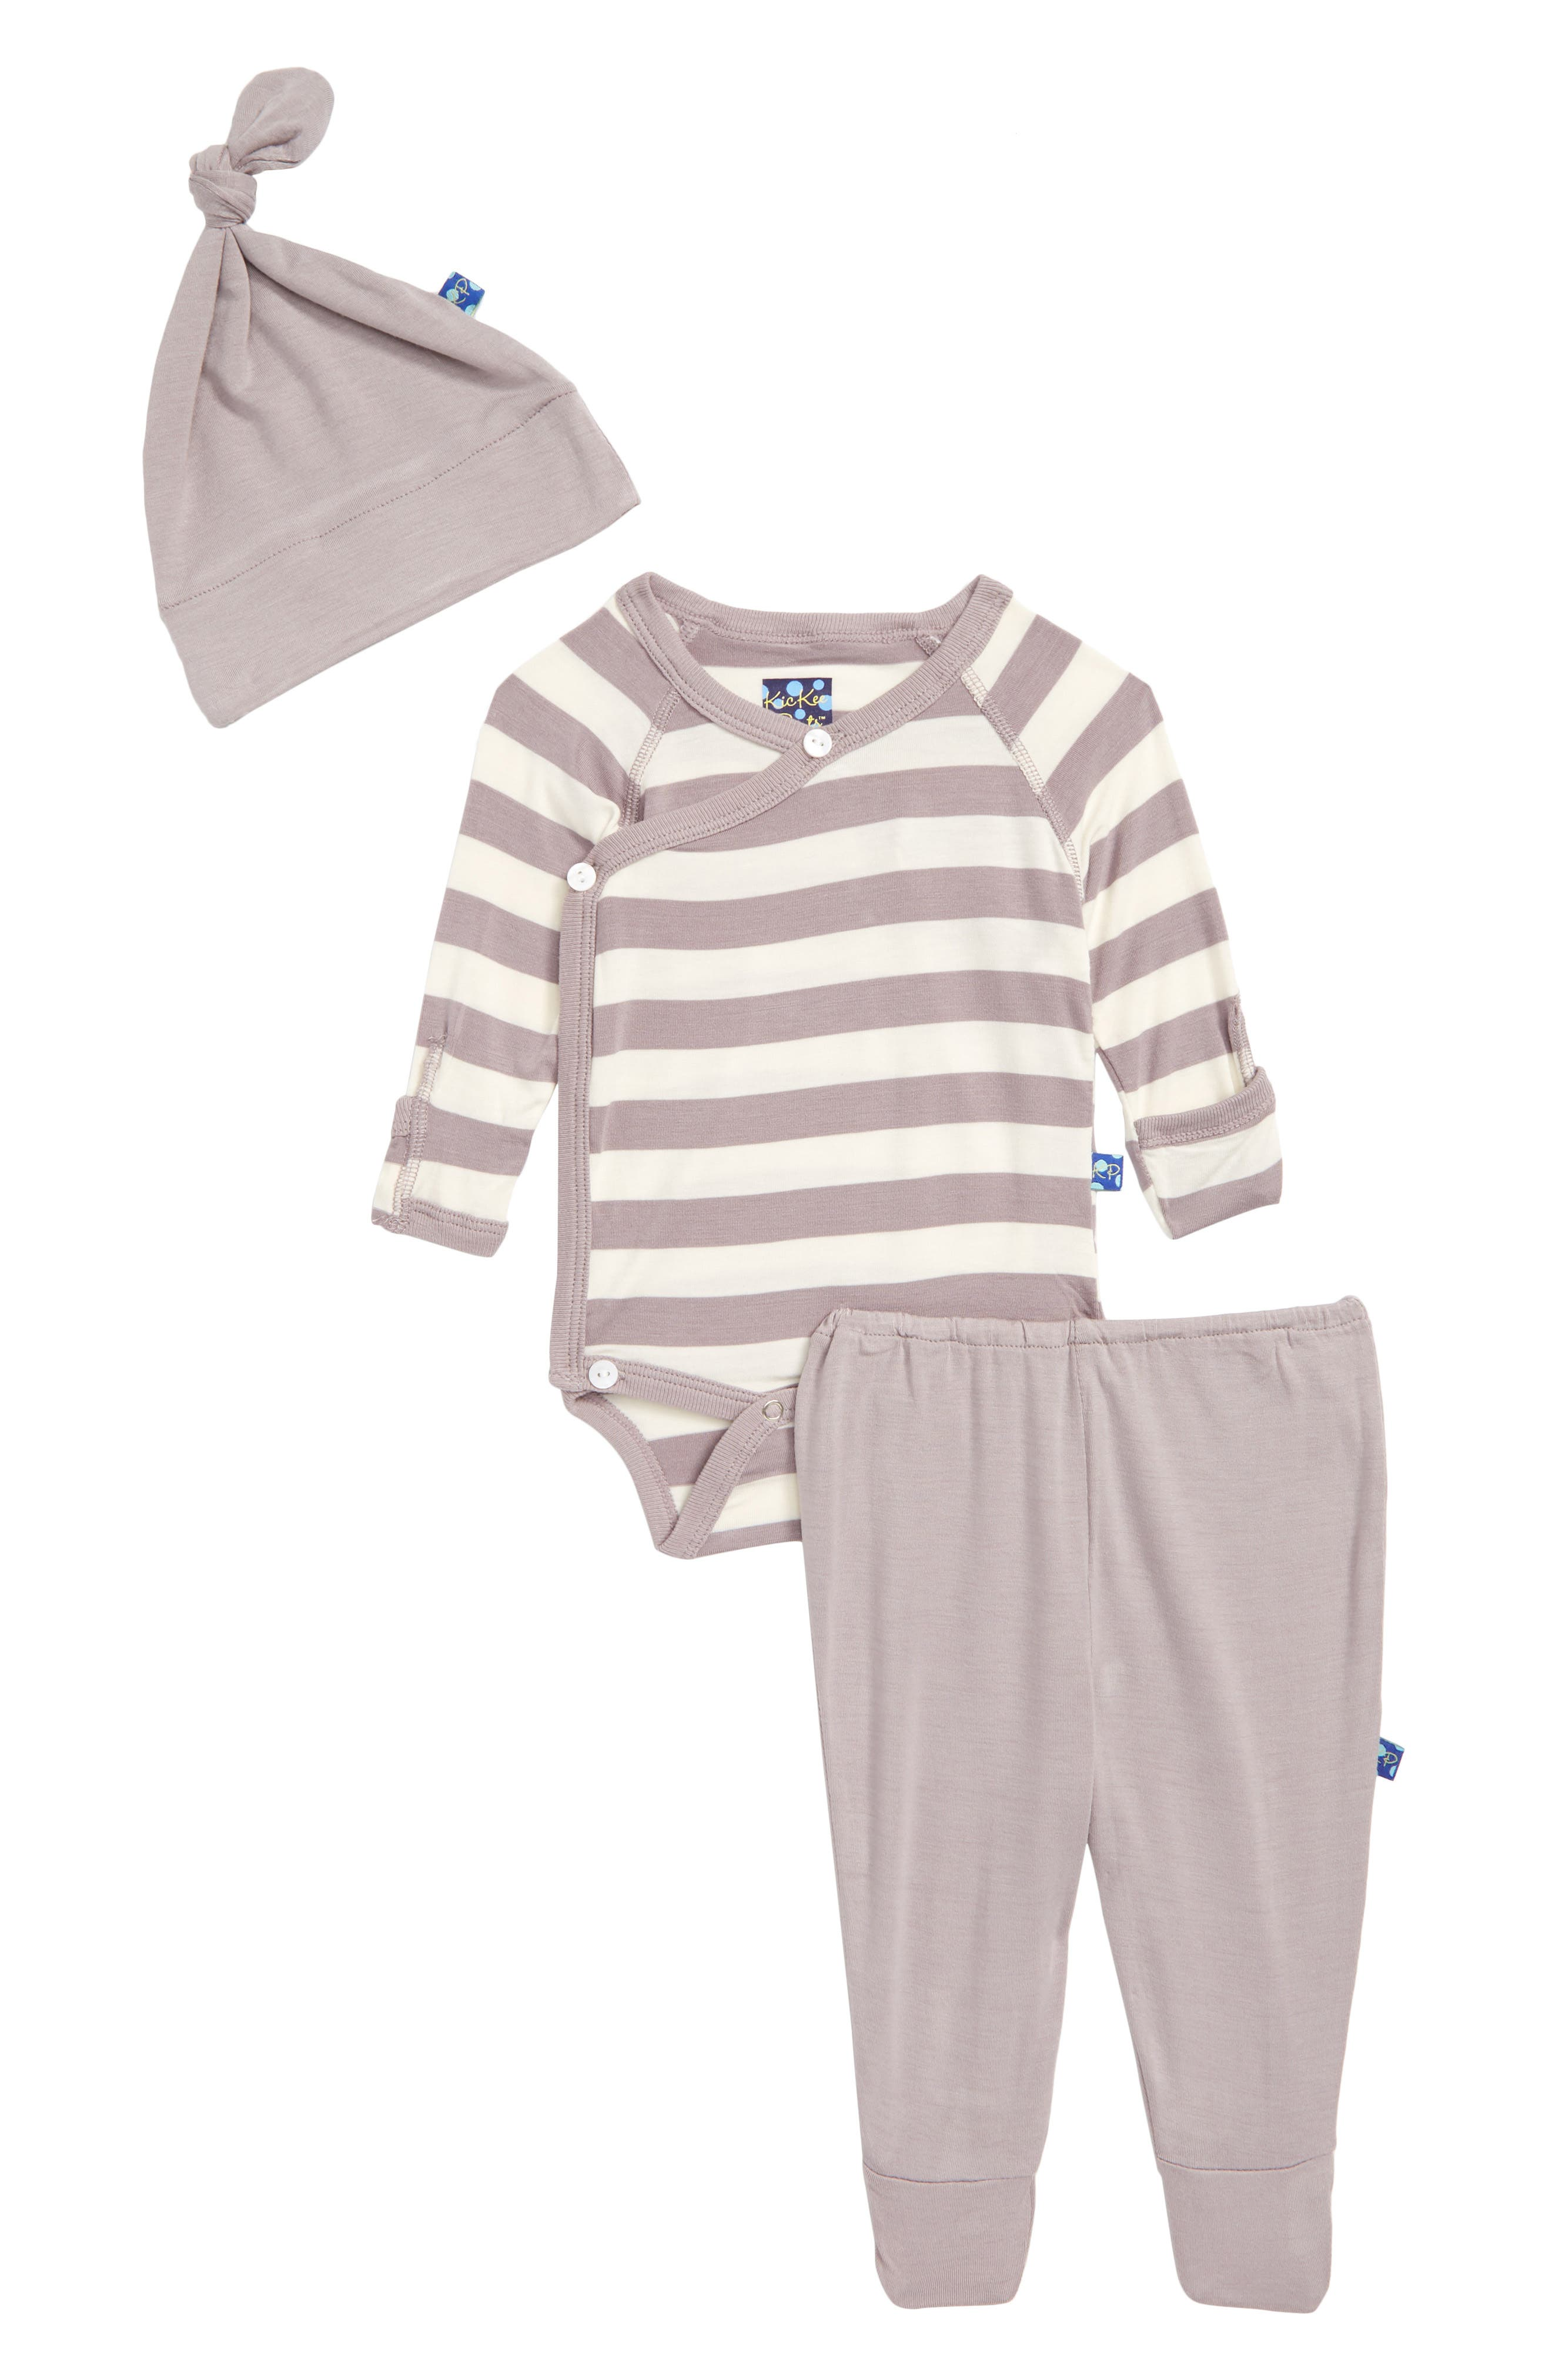 Feather Contrast Stripe Three-Piece Hat, Bodysuit & Pants Set,                             Main thumbnail 1, color,                             Feather/ Stripe